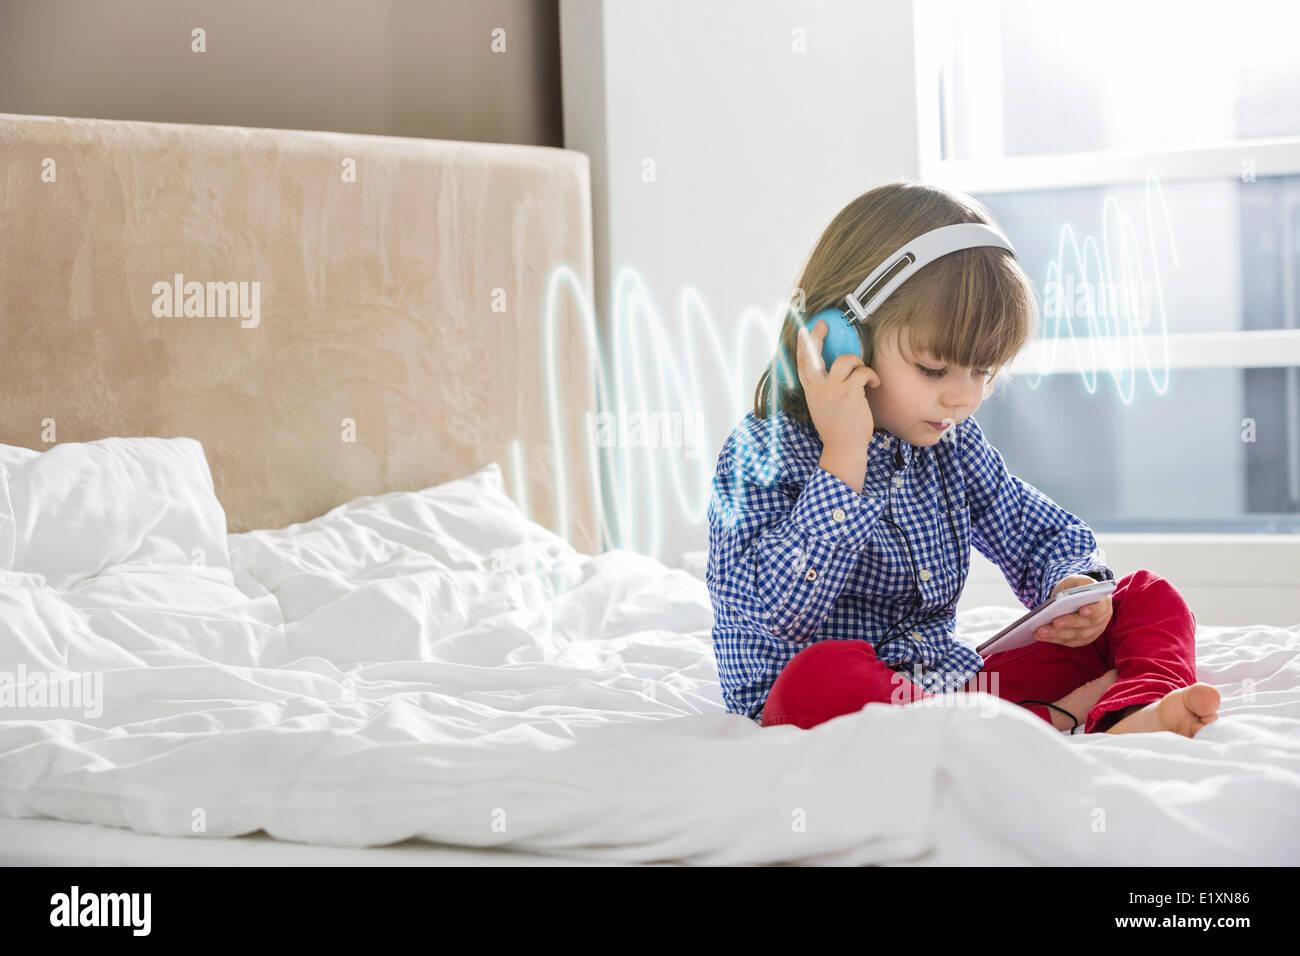 Full length of boy listening music through headphones on bed - Stock Image